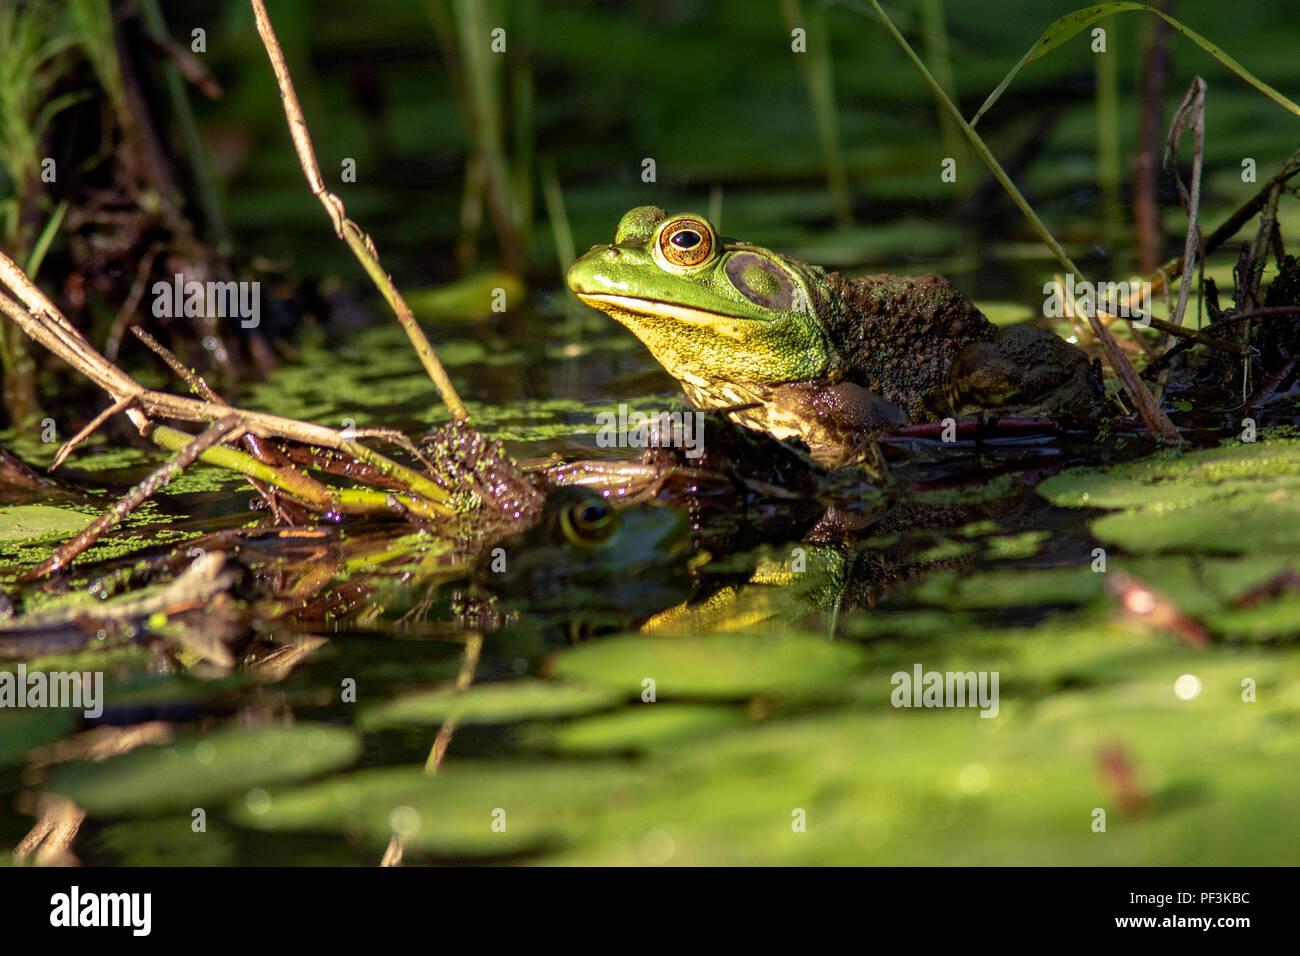 American Bullfrog (Lithobates catesbeianus) - Indian Point Trail - Il Giardino degli dèi, Shawnee National Forest, Illinois, Stati Uniti d'America Immagini Stock